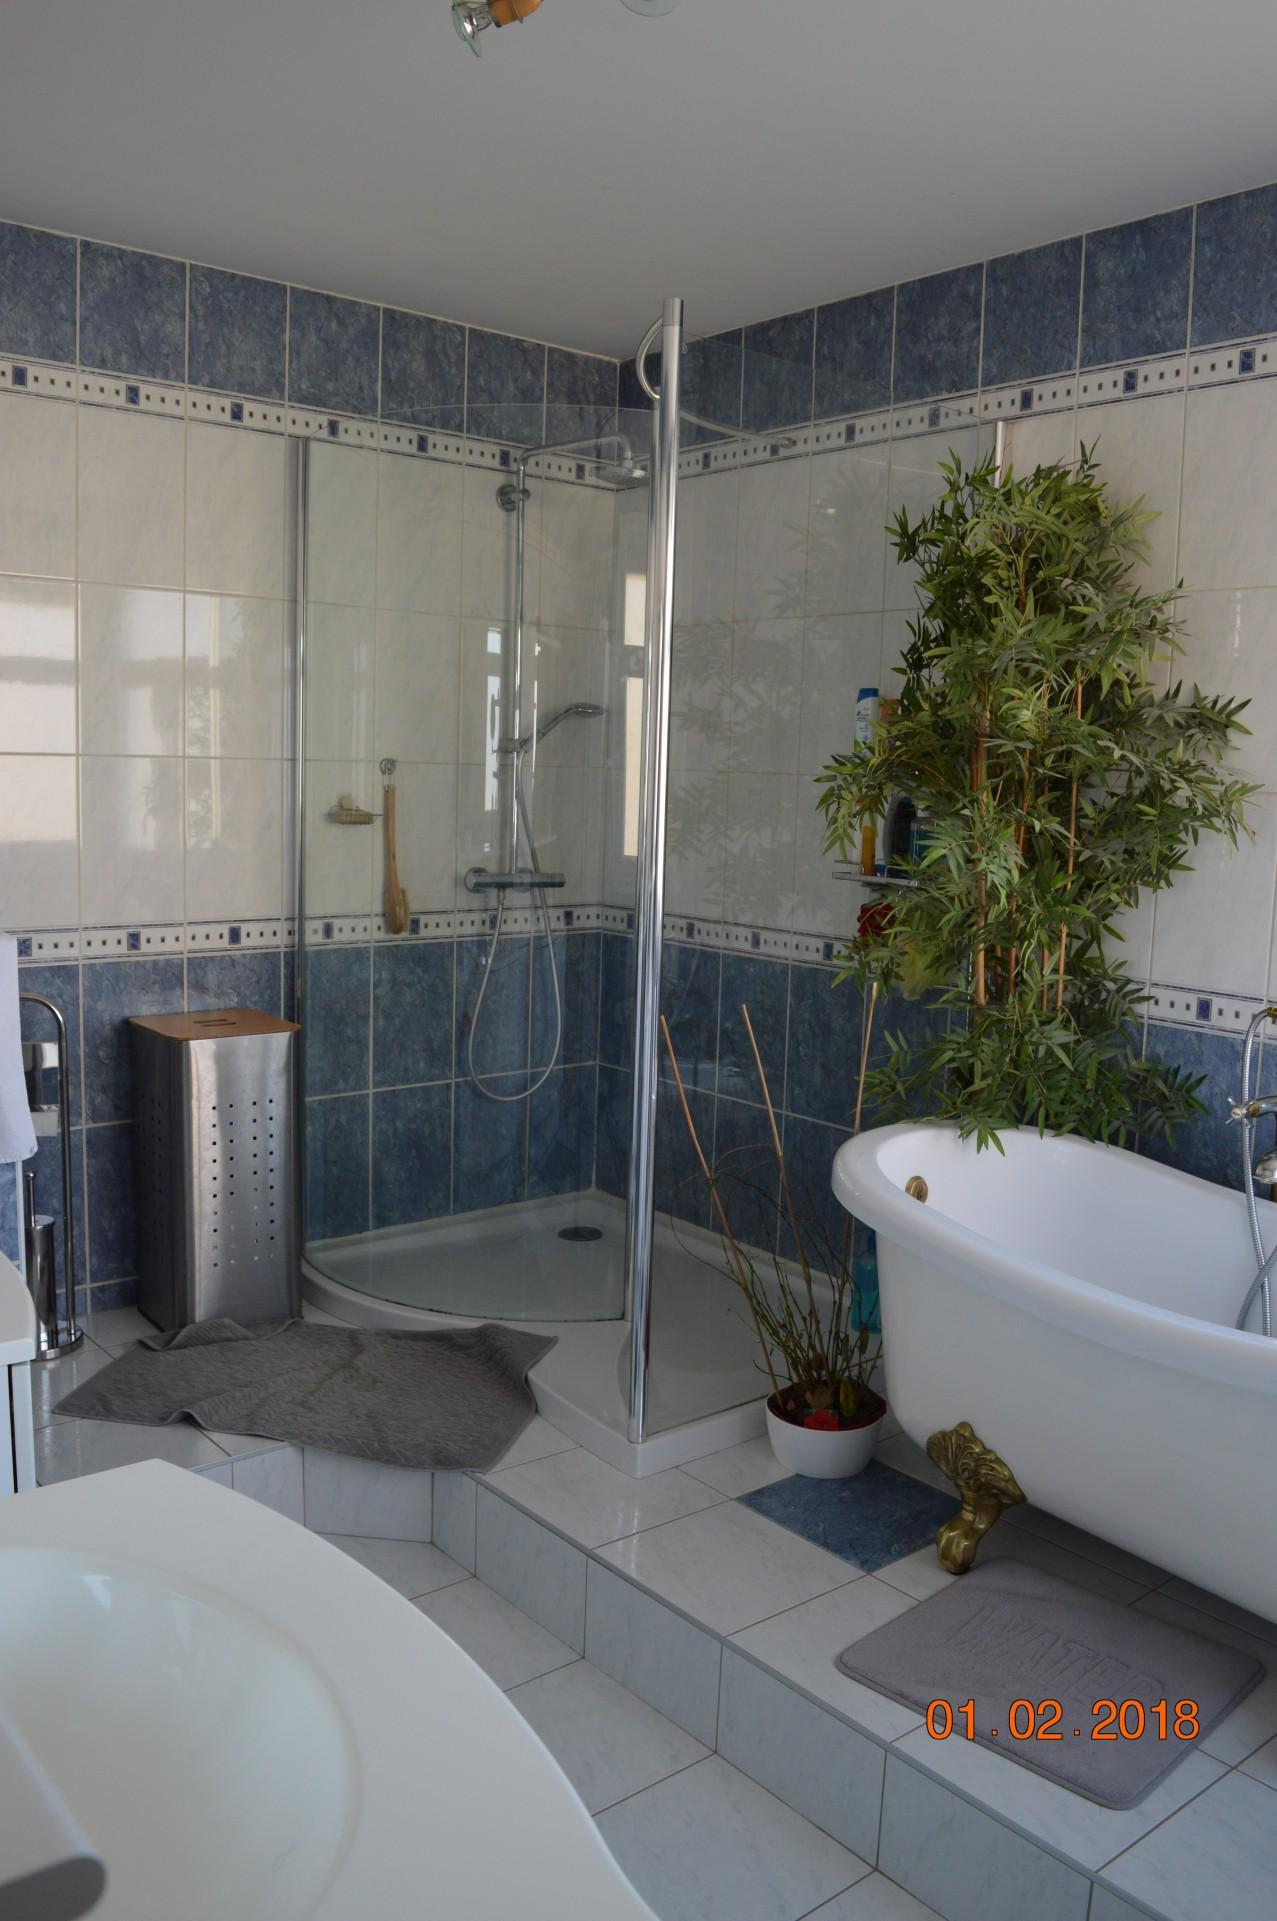 bathroom_guesthouse_lemans_24h_b&b